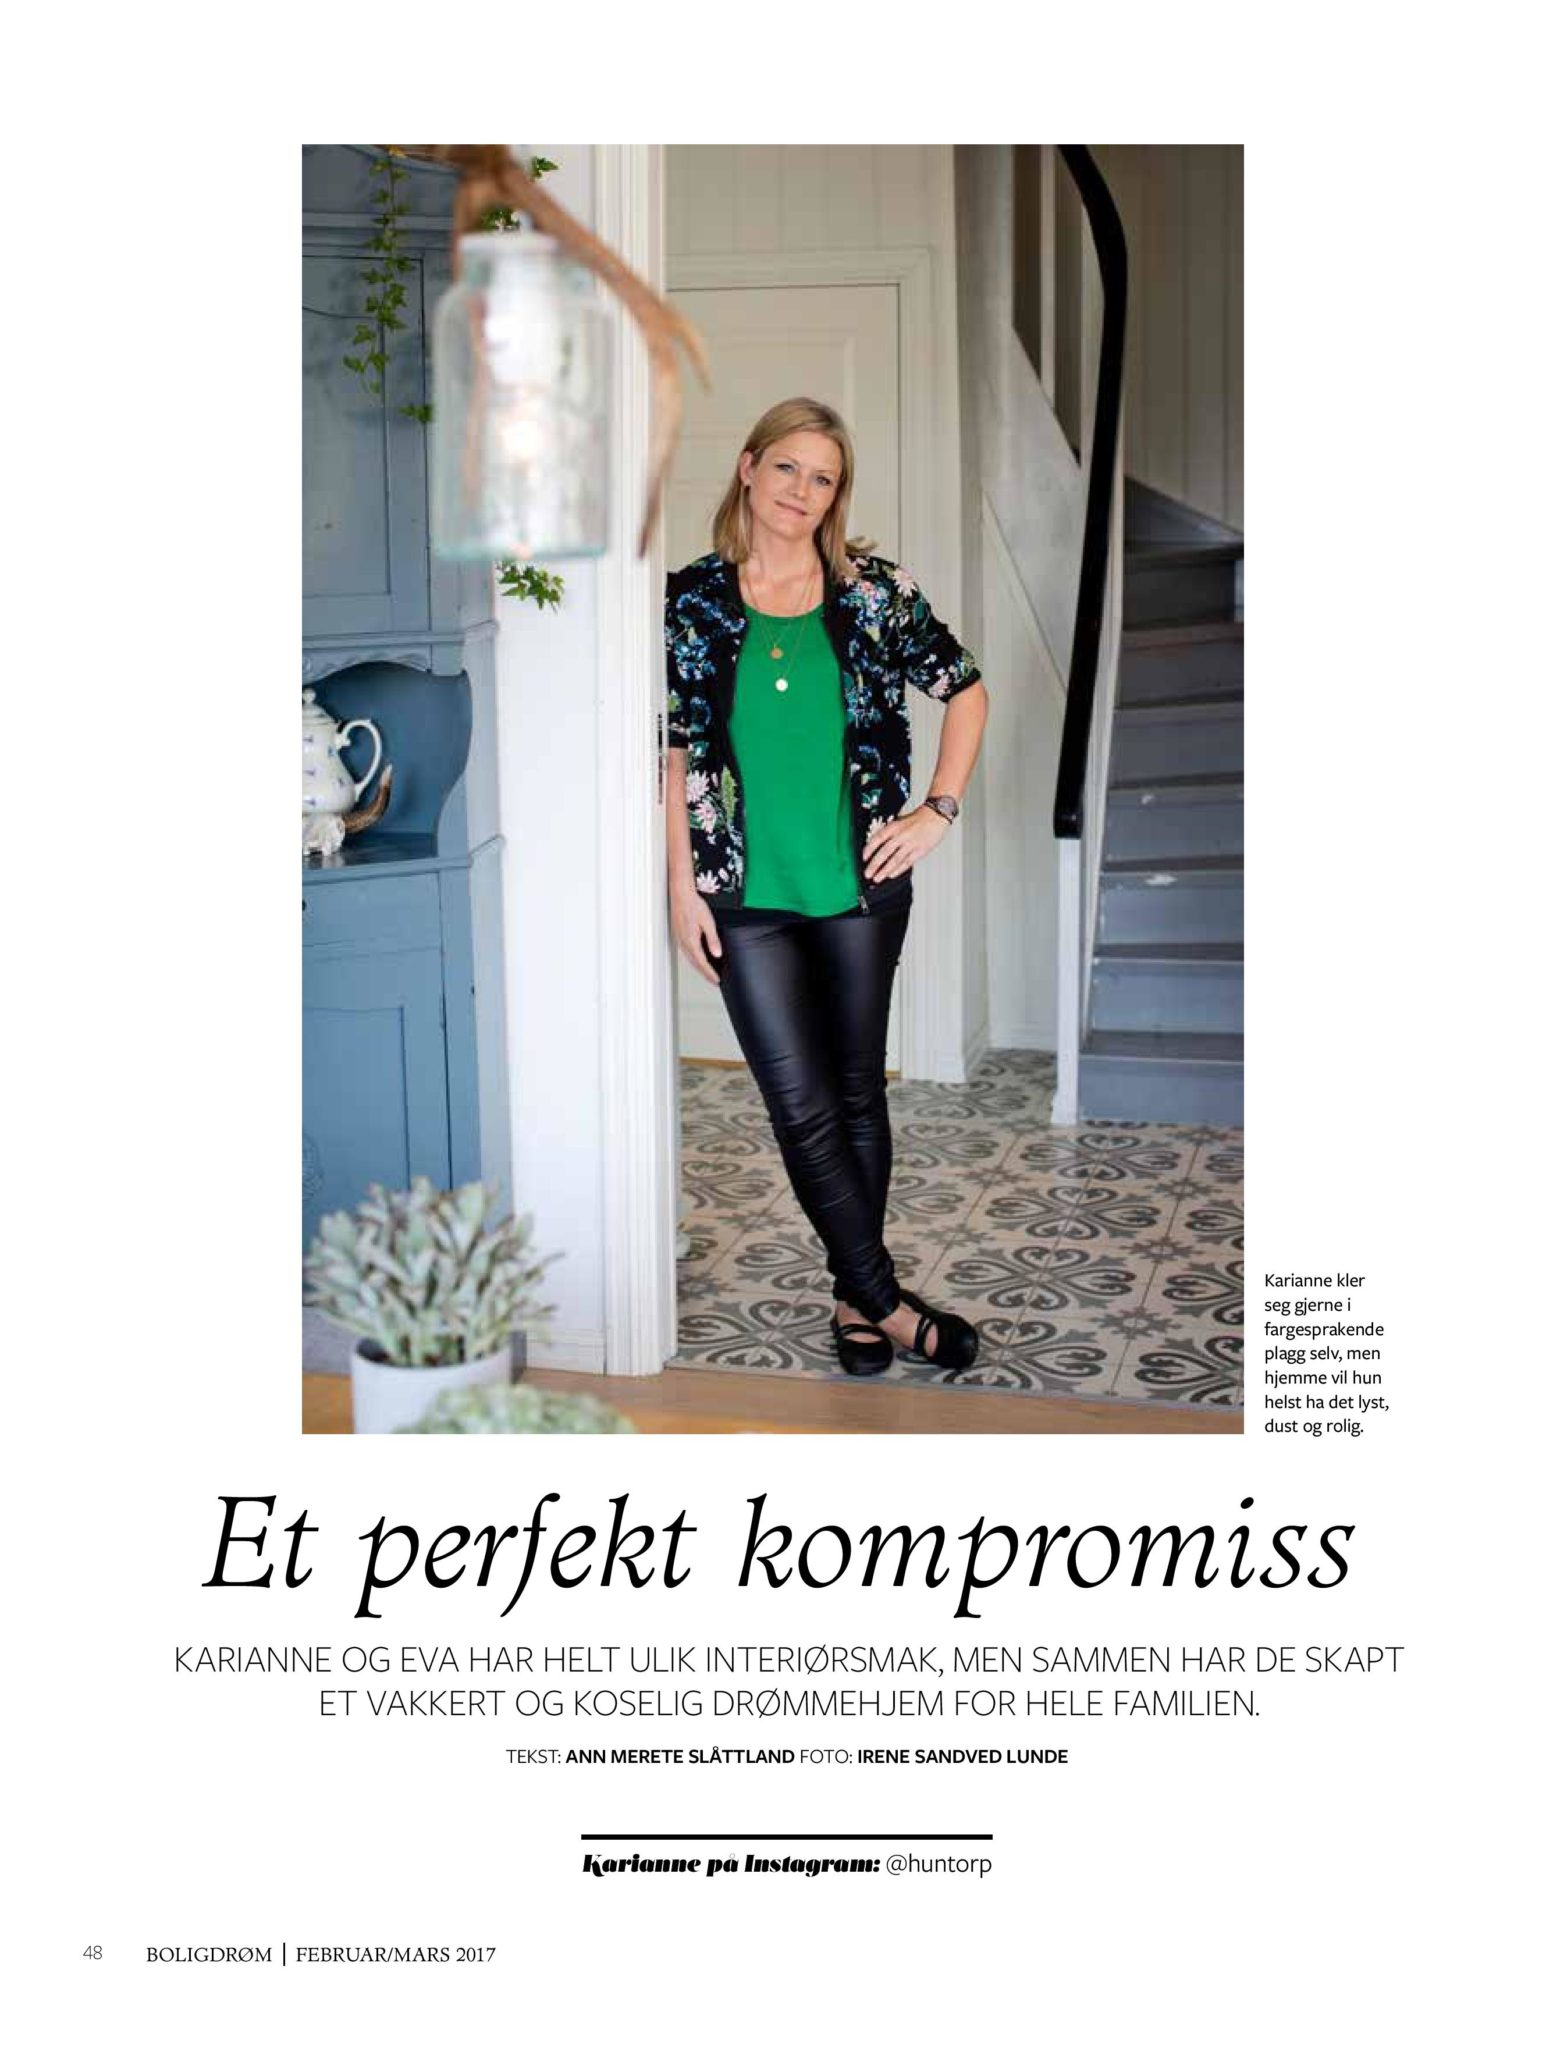 boligreportasje Karianne Gustavsen BoligDrøm nr. 2/2017 side 1